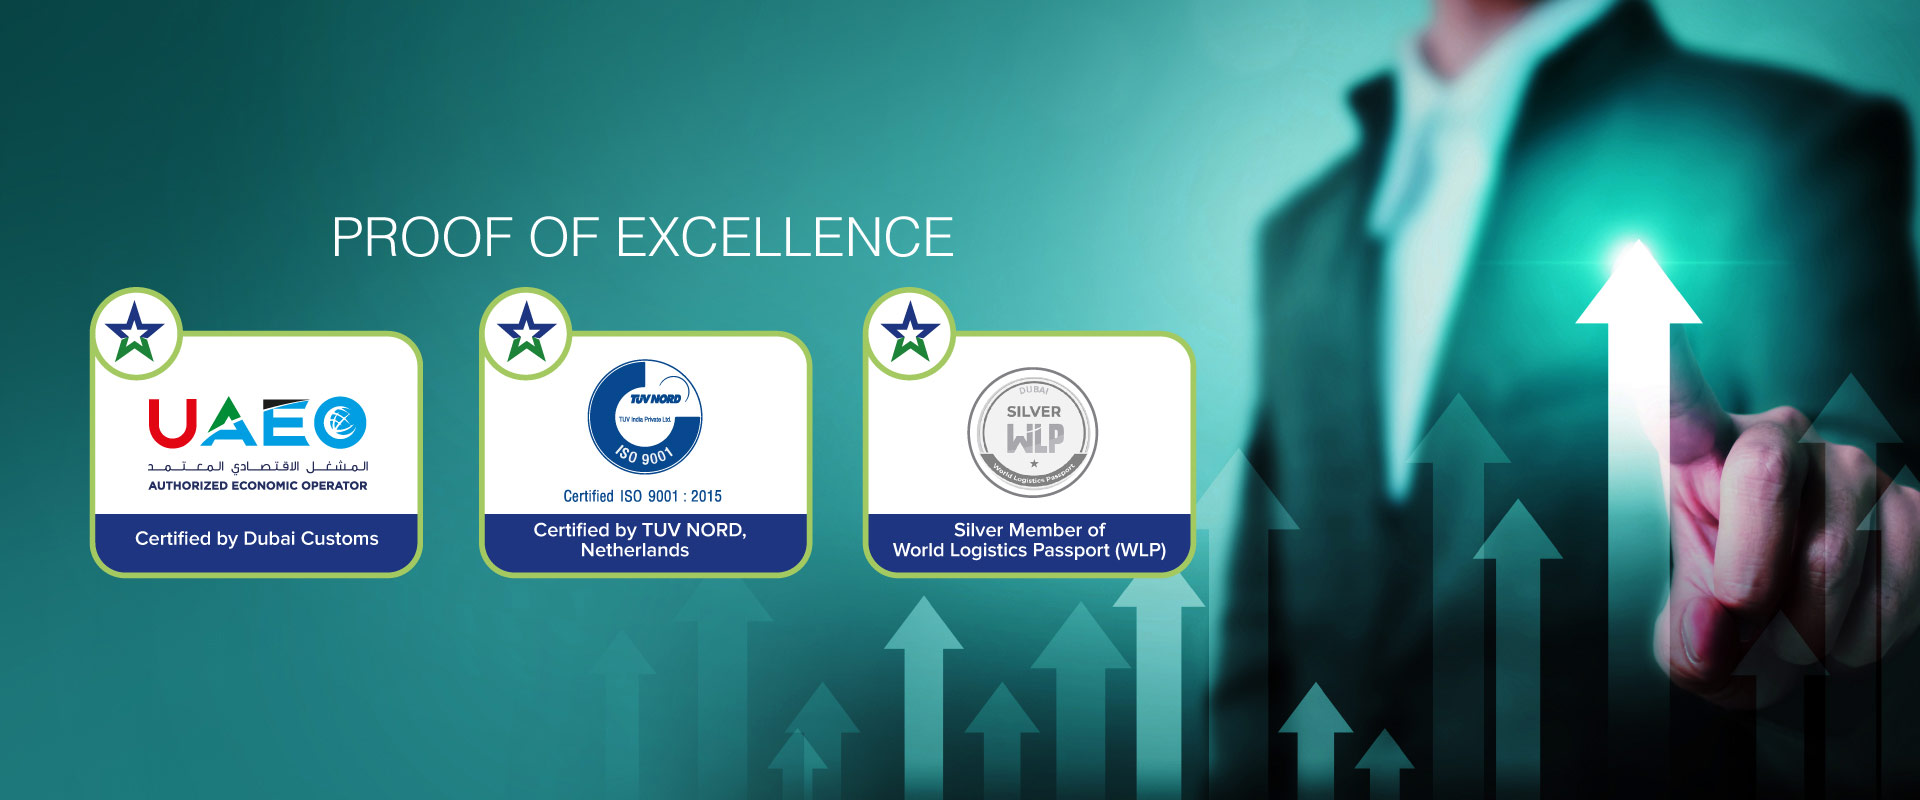 Globelink West Star- AEO Certified by Dubai Customs